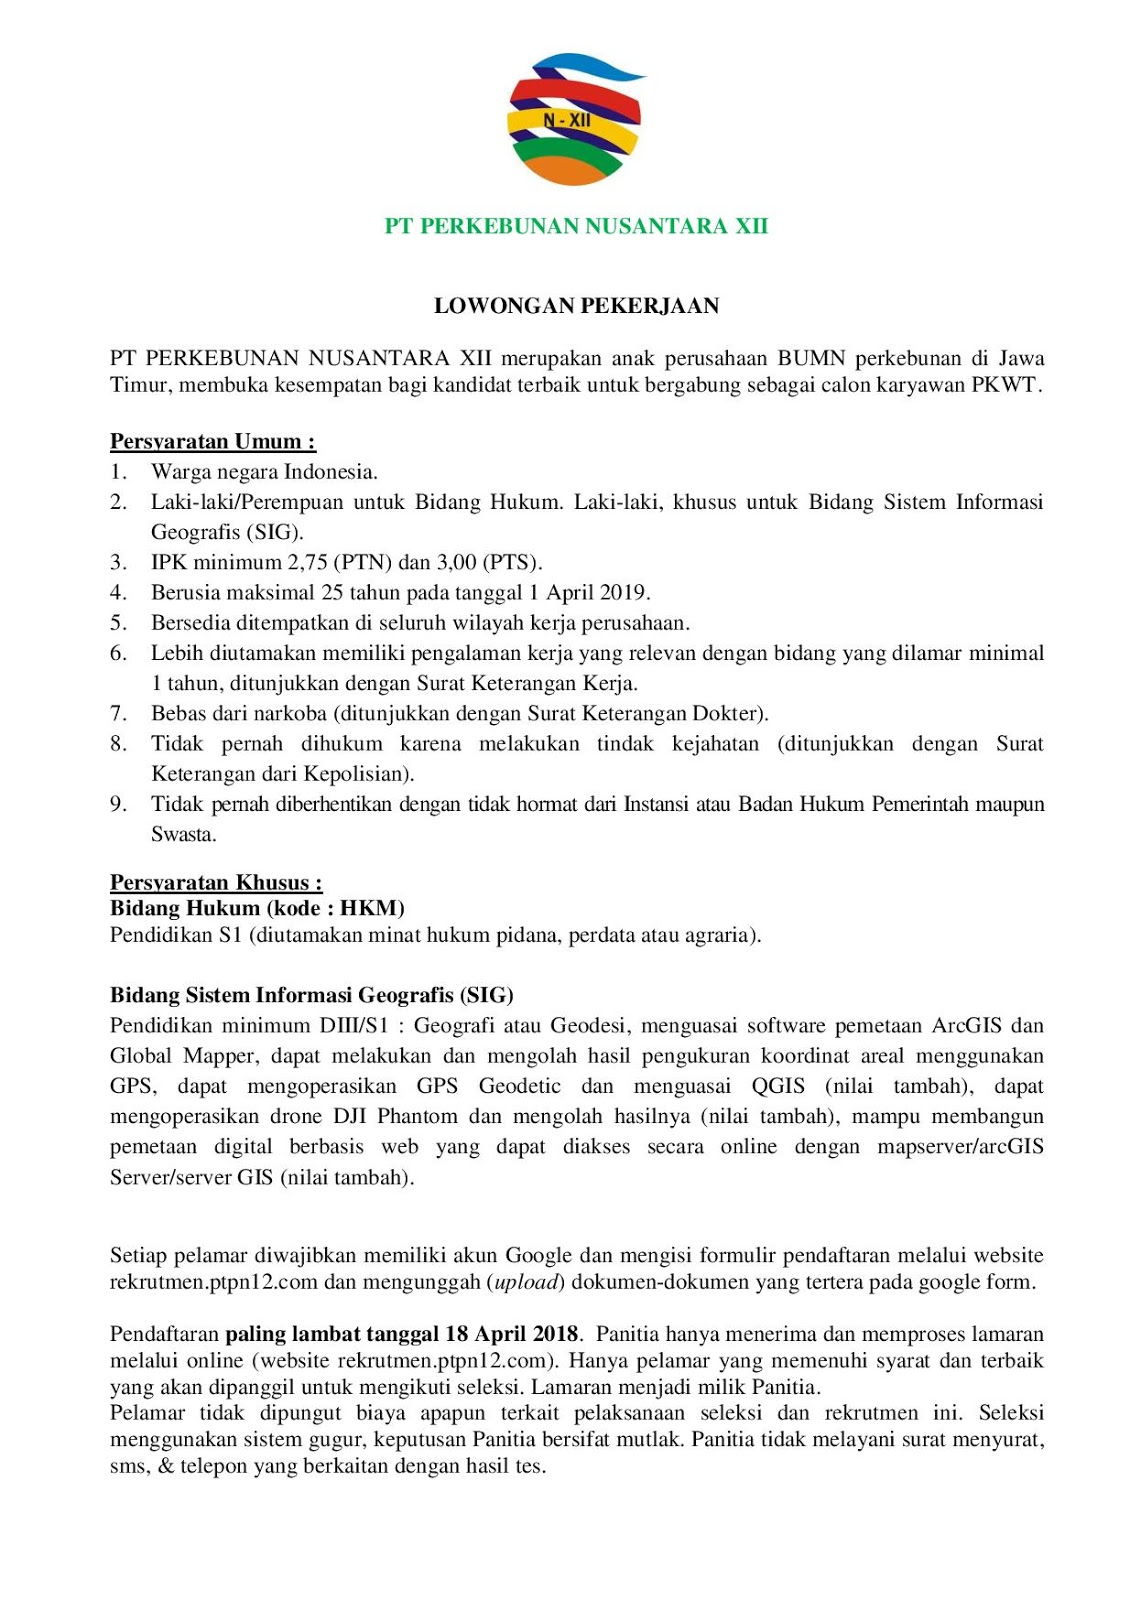 Lowongan Kerja PT Perkebunan Nusantara XII (Persero) April 2019